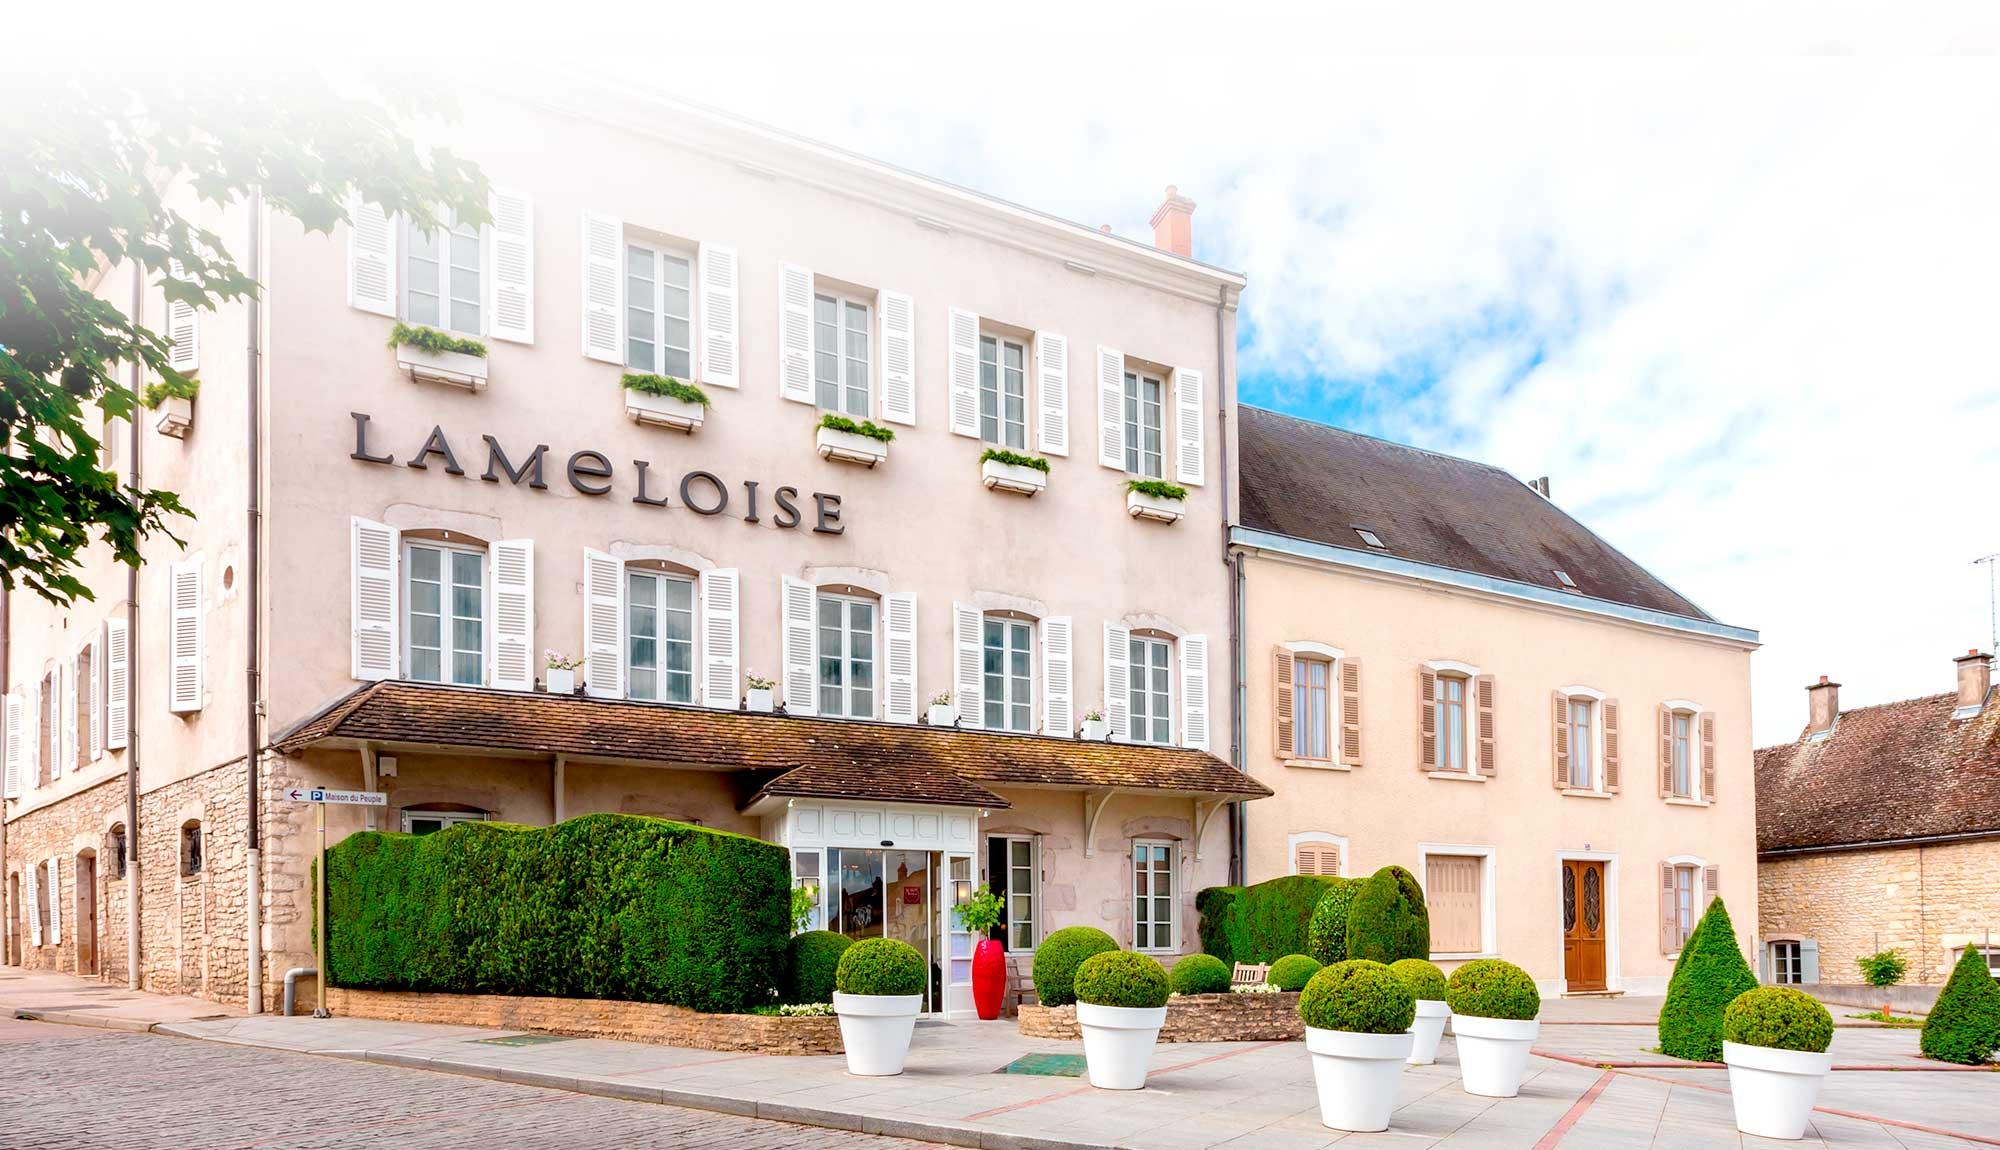 Carte De Bourgogne Michelin.Maison Lameloise Restaurant 3 Michelin Star Chagny